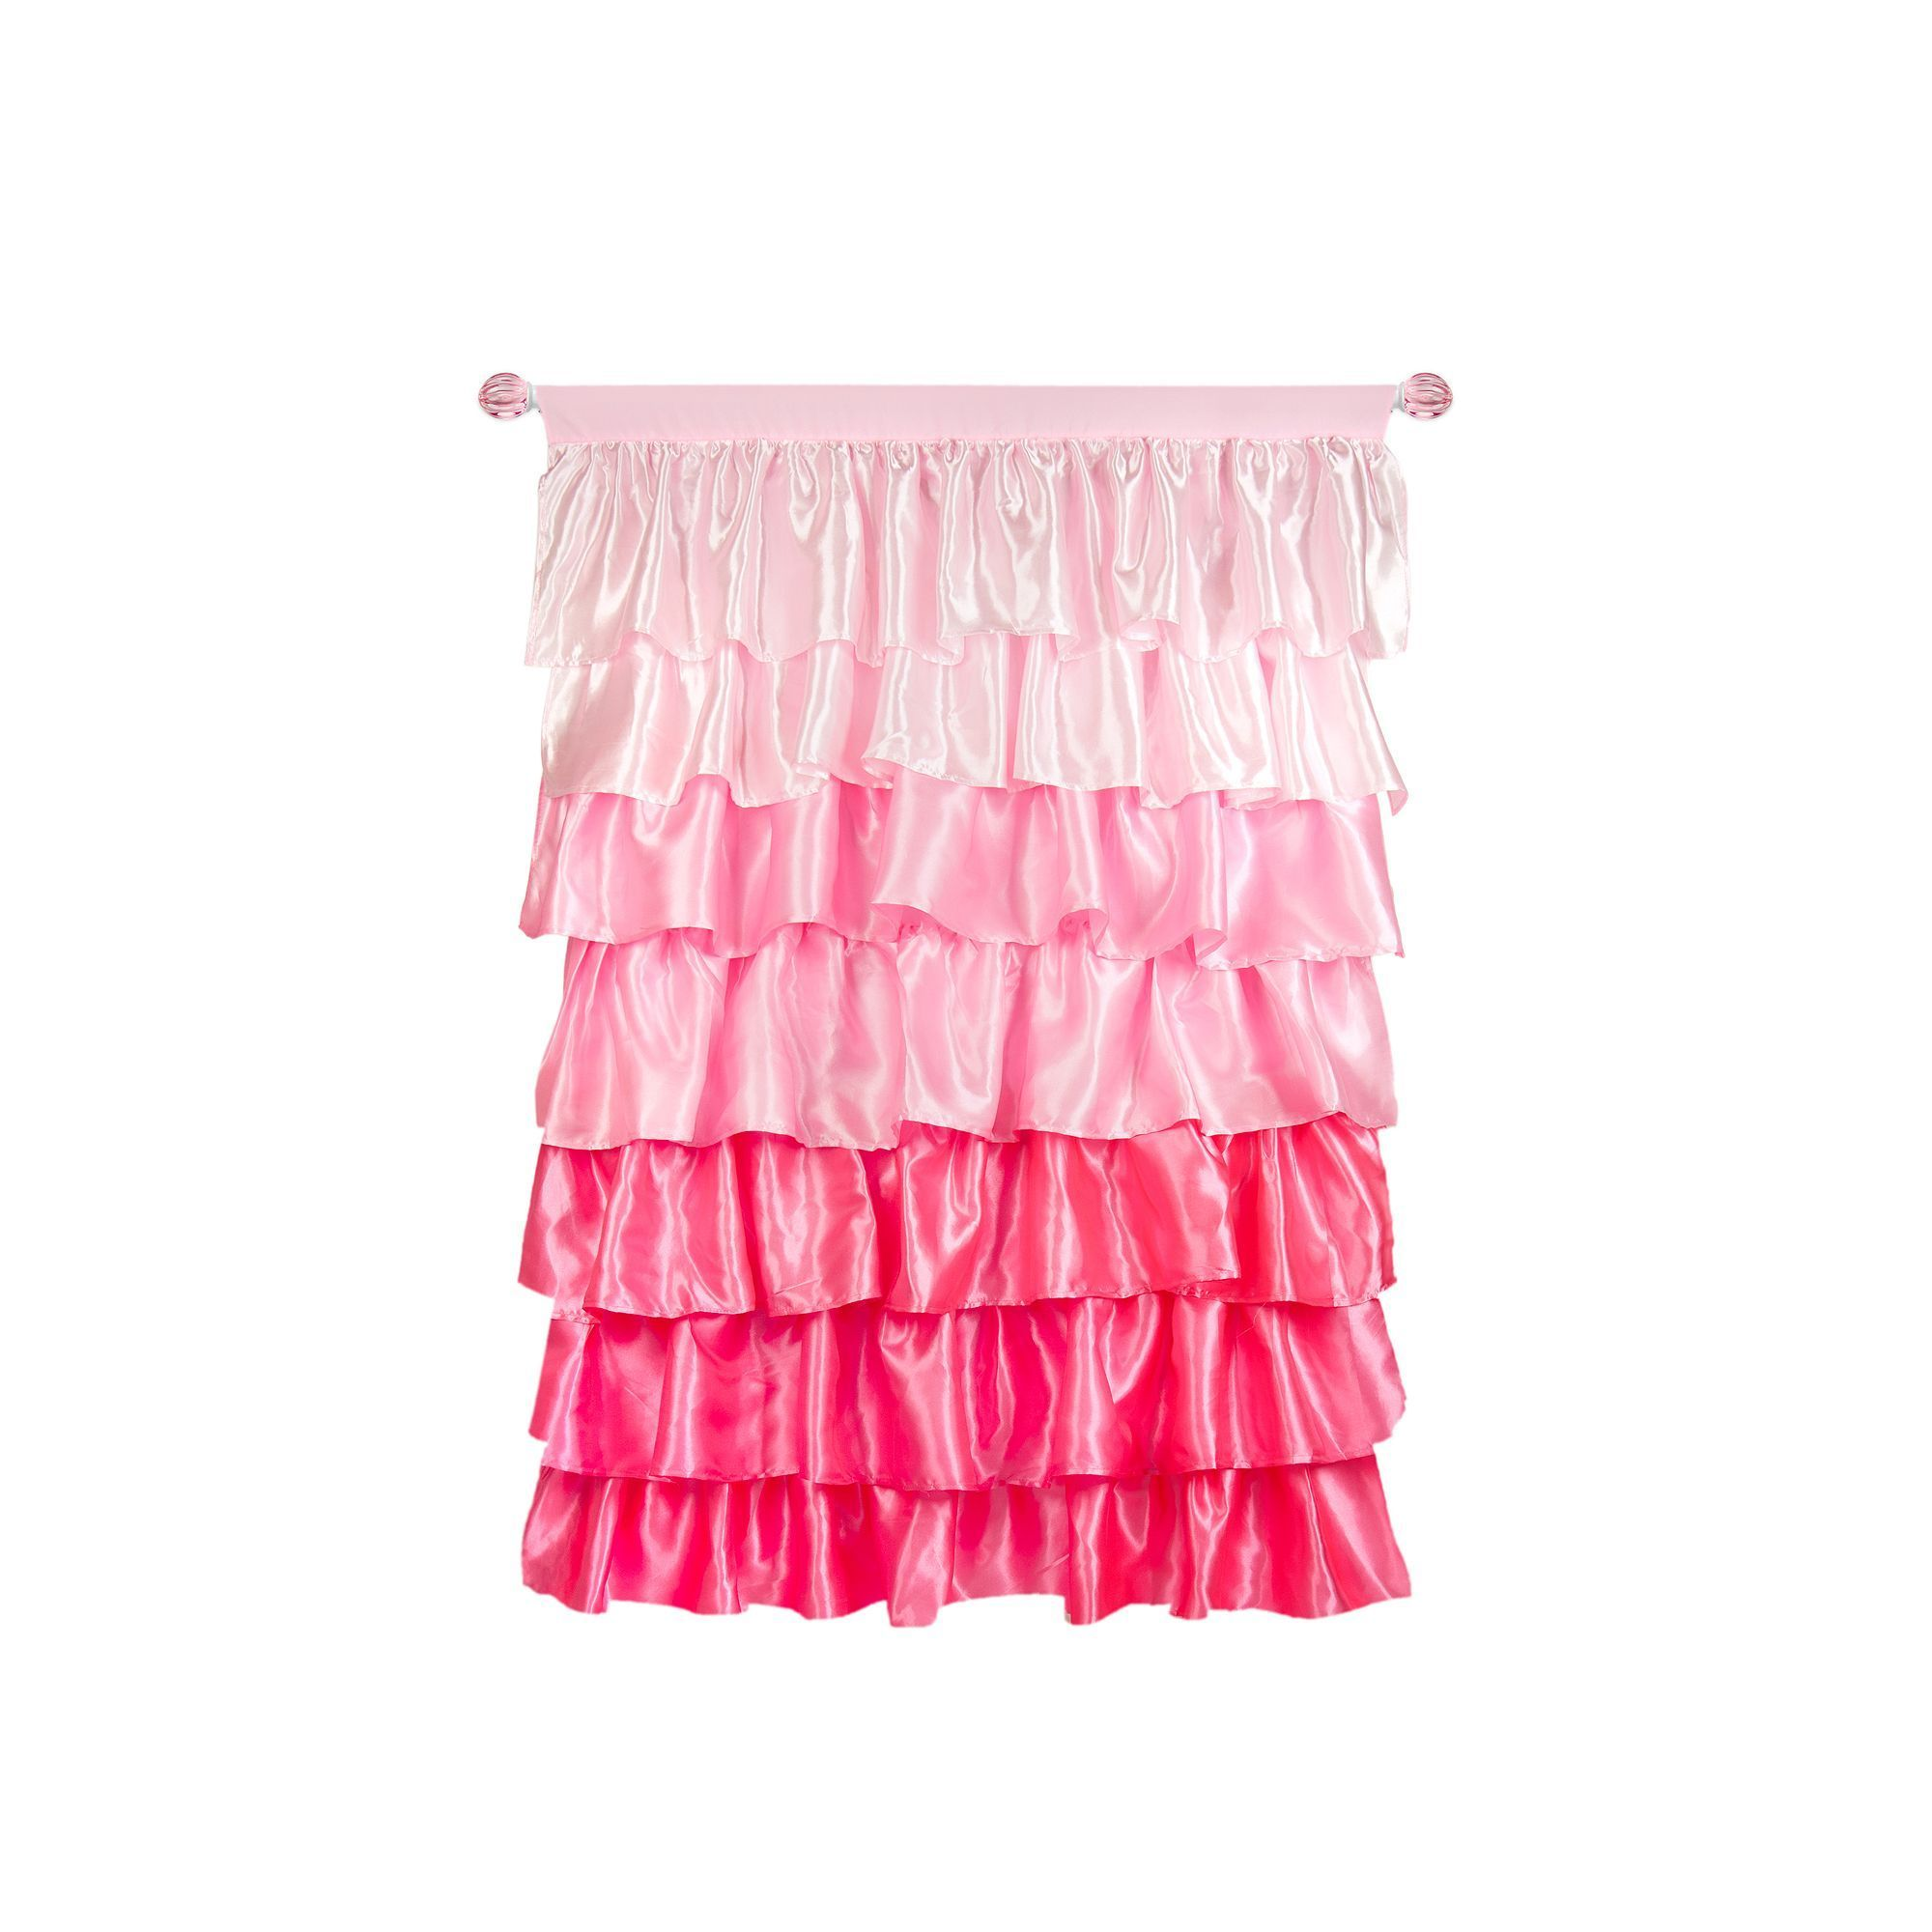 Tadpoles Tiered Ruffled Satin Curtain Panel Pink Pink Ruffle